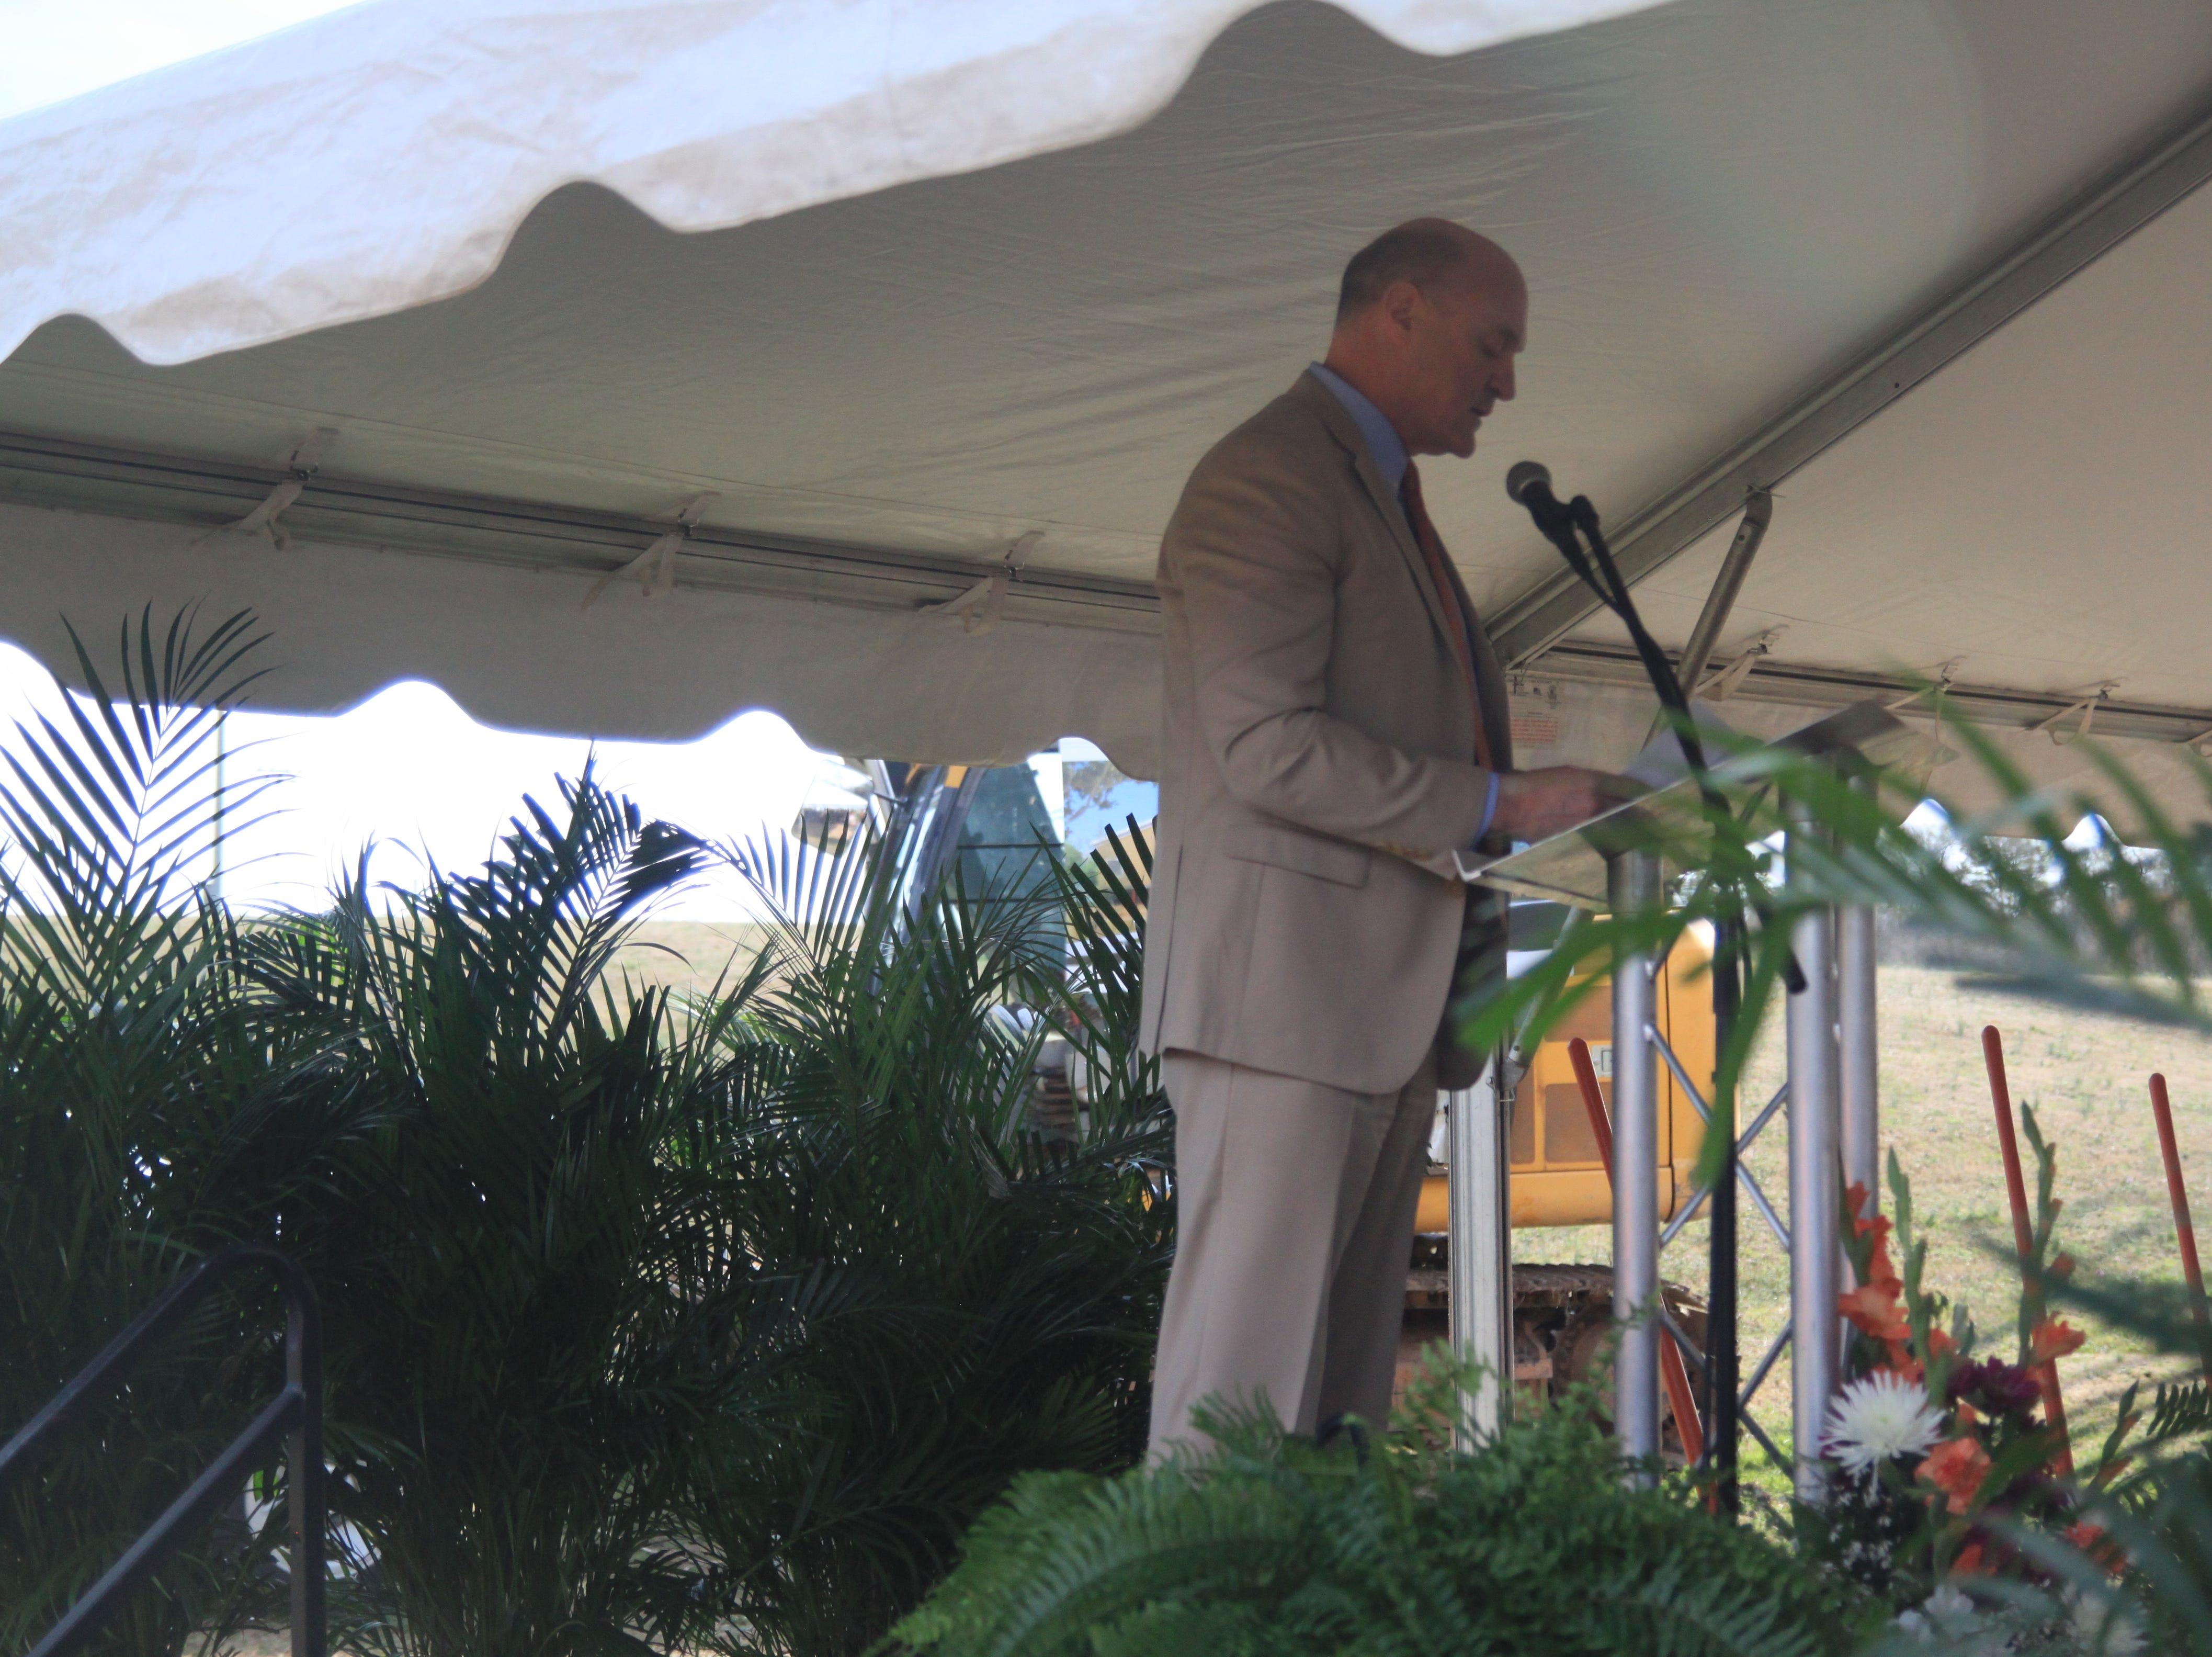 President Jim Clements speaks at the groundbreaking for the Child Development Center.